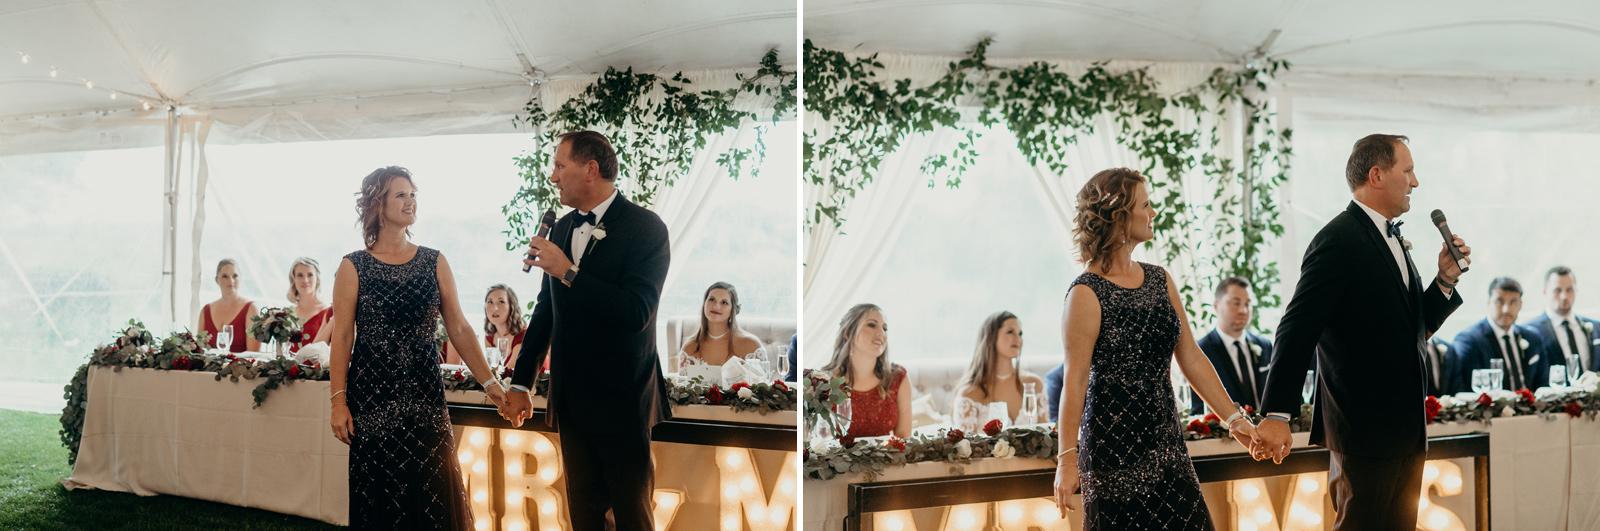 Jasmine and Colby Glen Oaks Wedding | Iowa Wedding Photographer Brian Davis